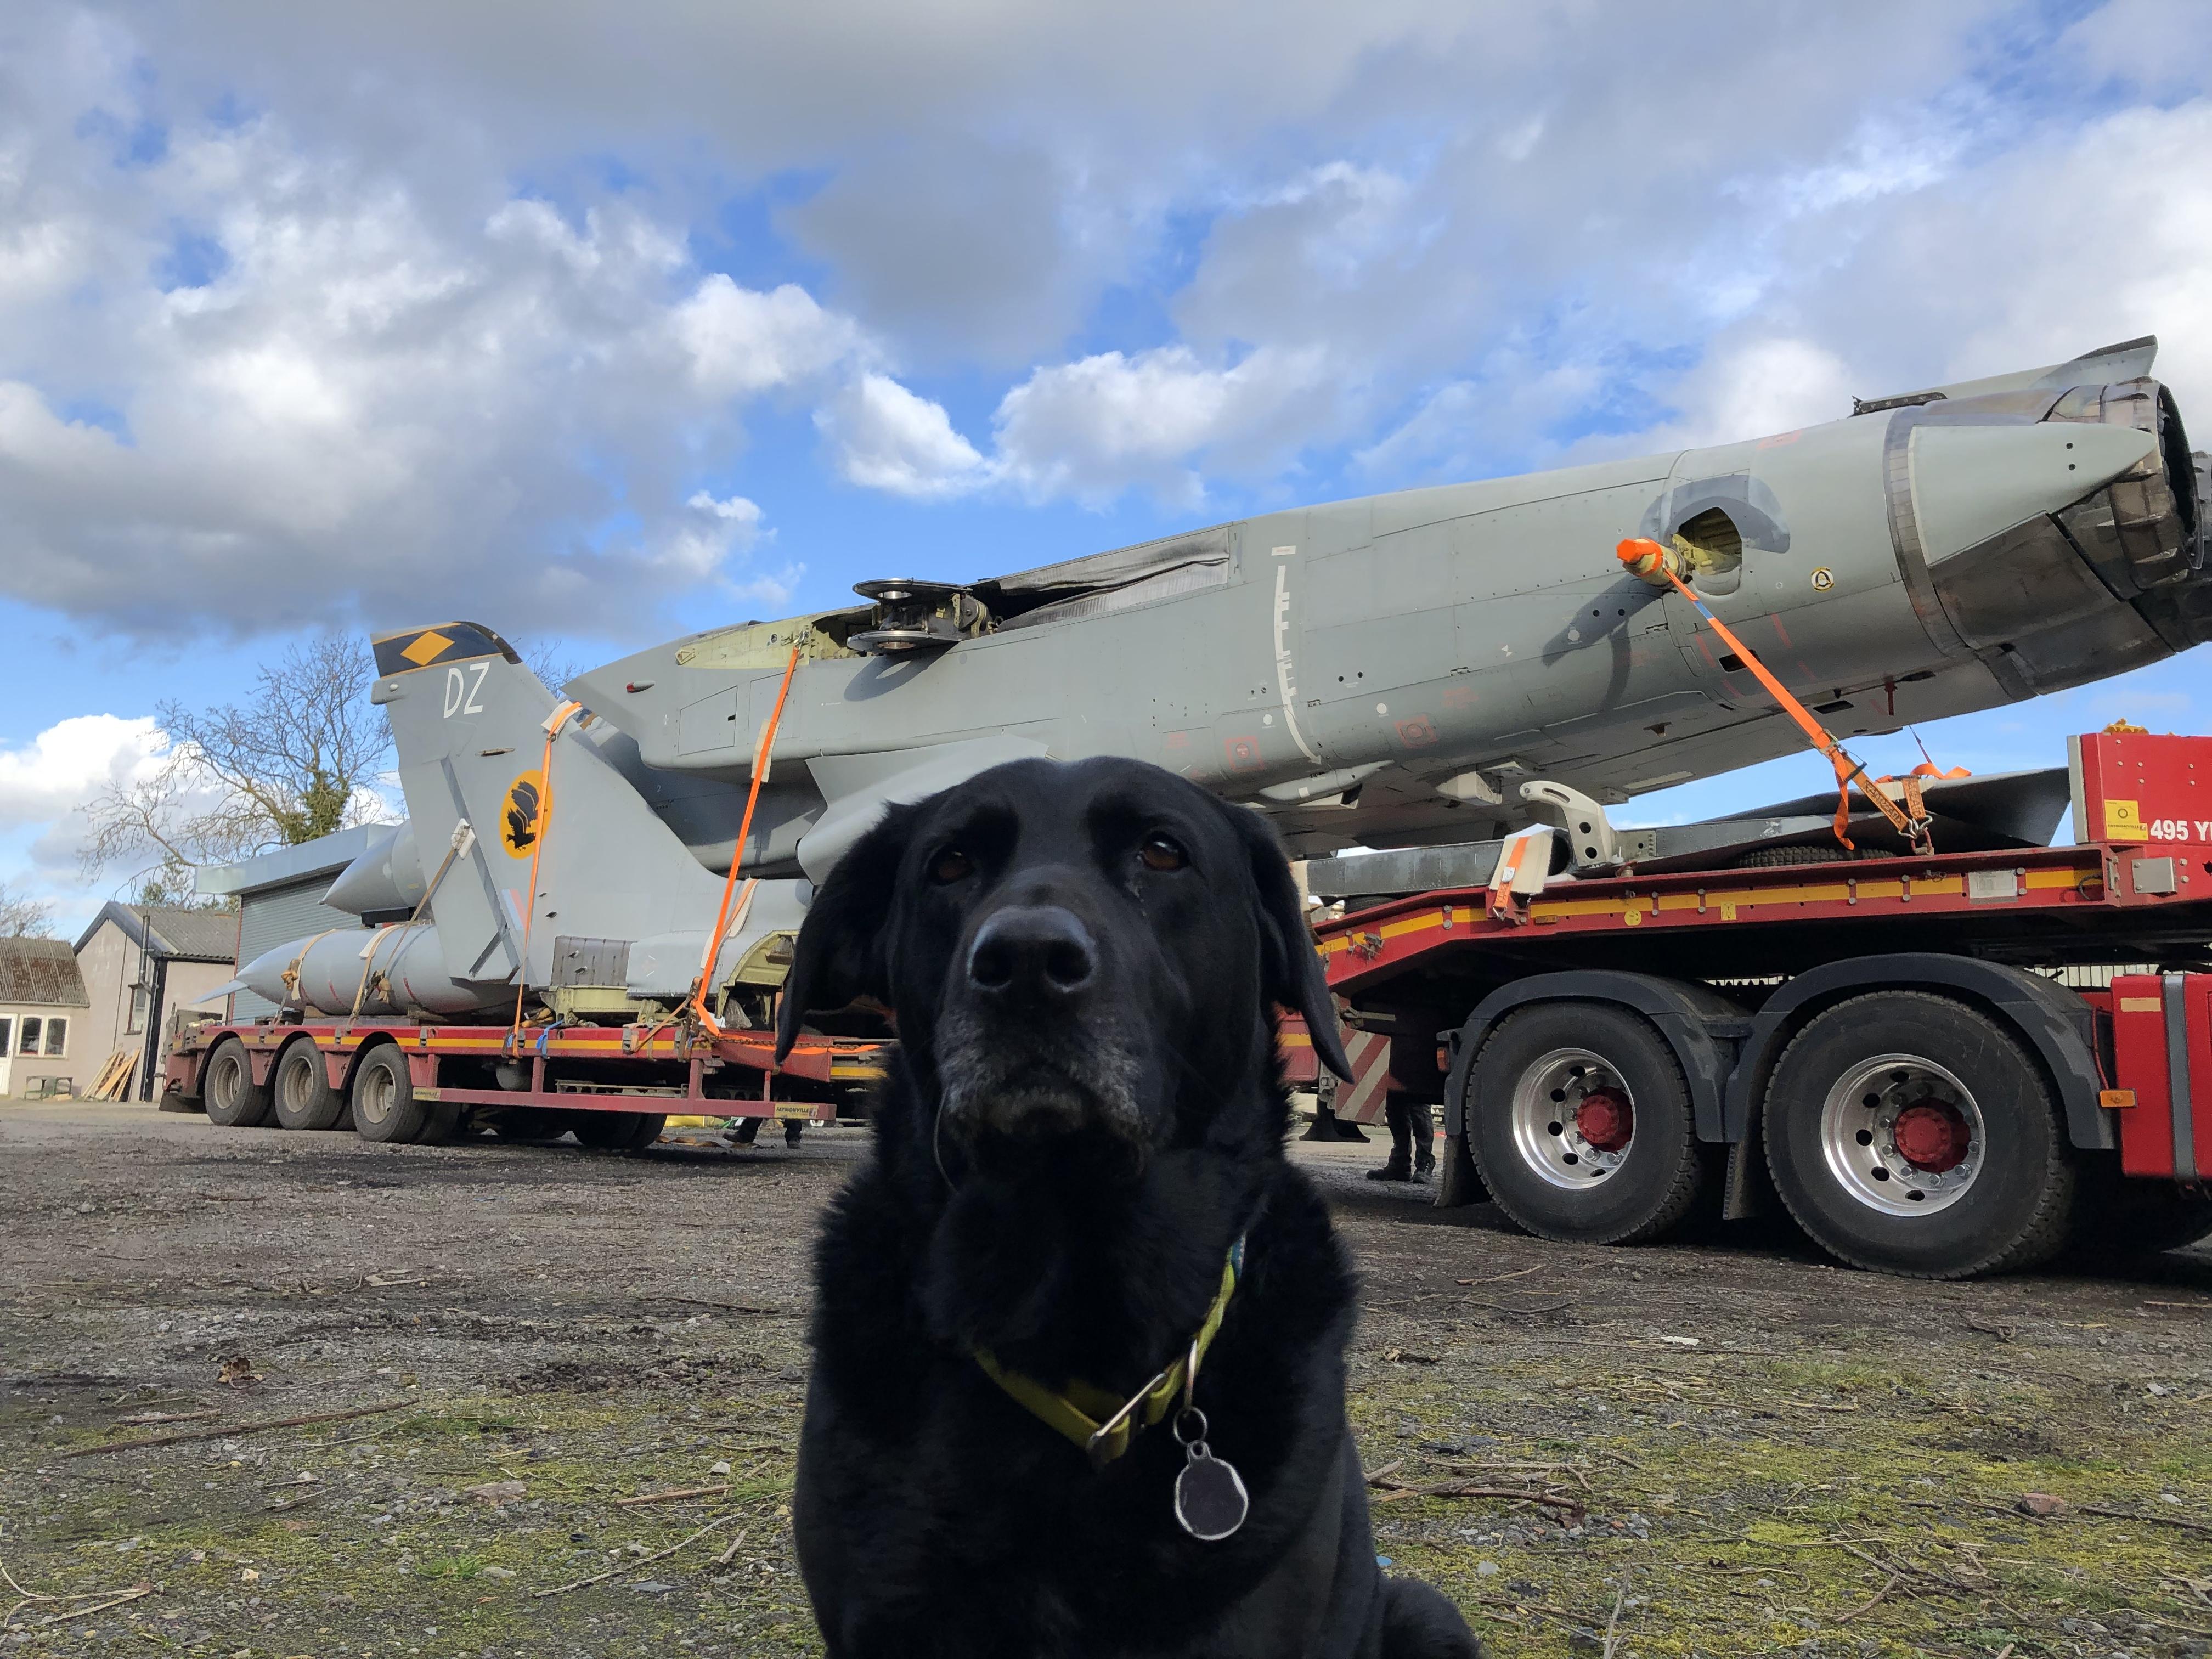 Tornado F3 shipping